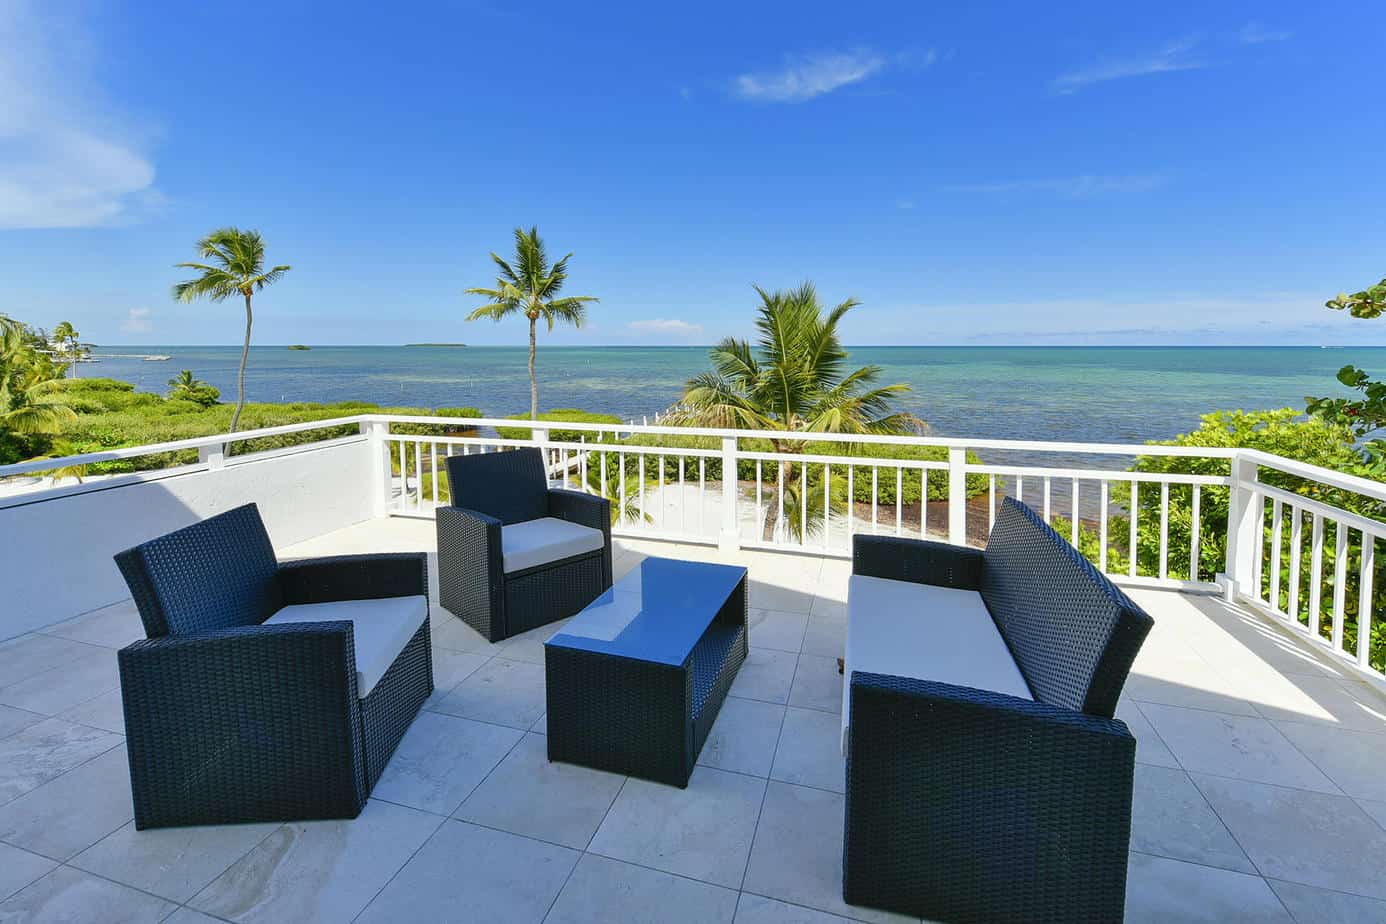 Florida Keys Day 3 – Islamorada and Art!